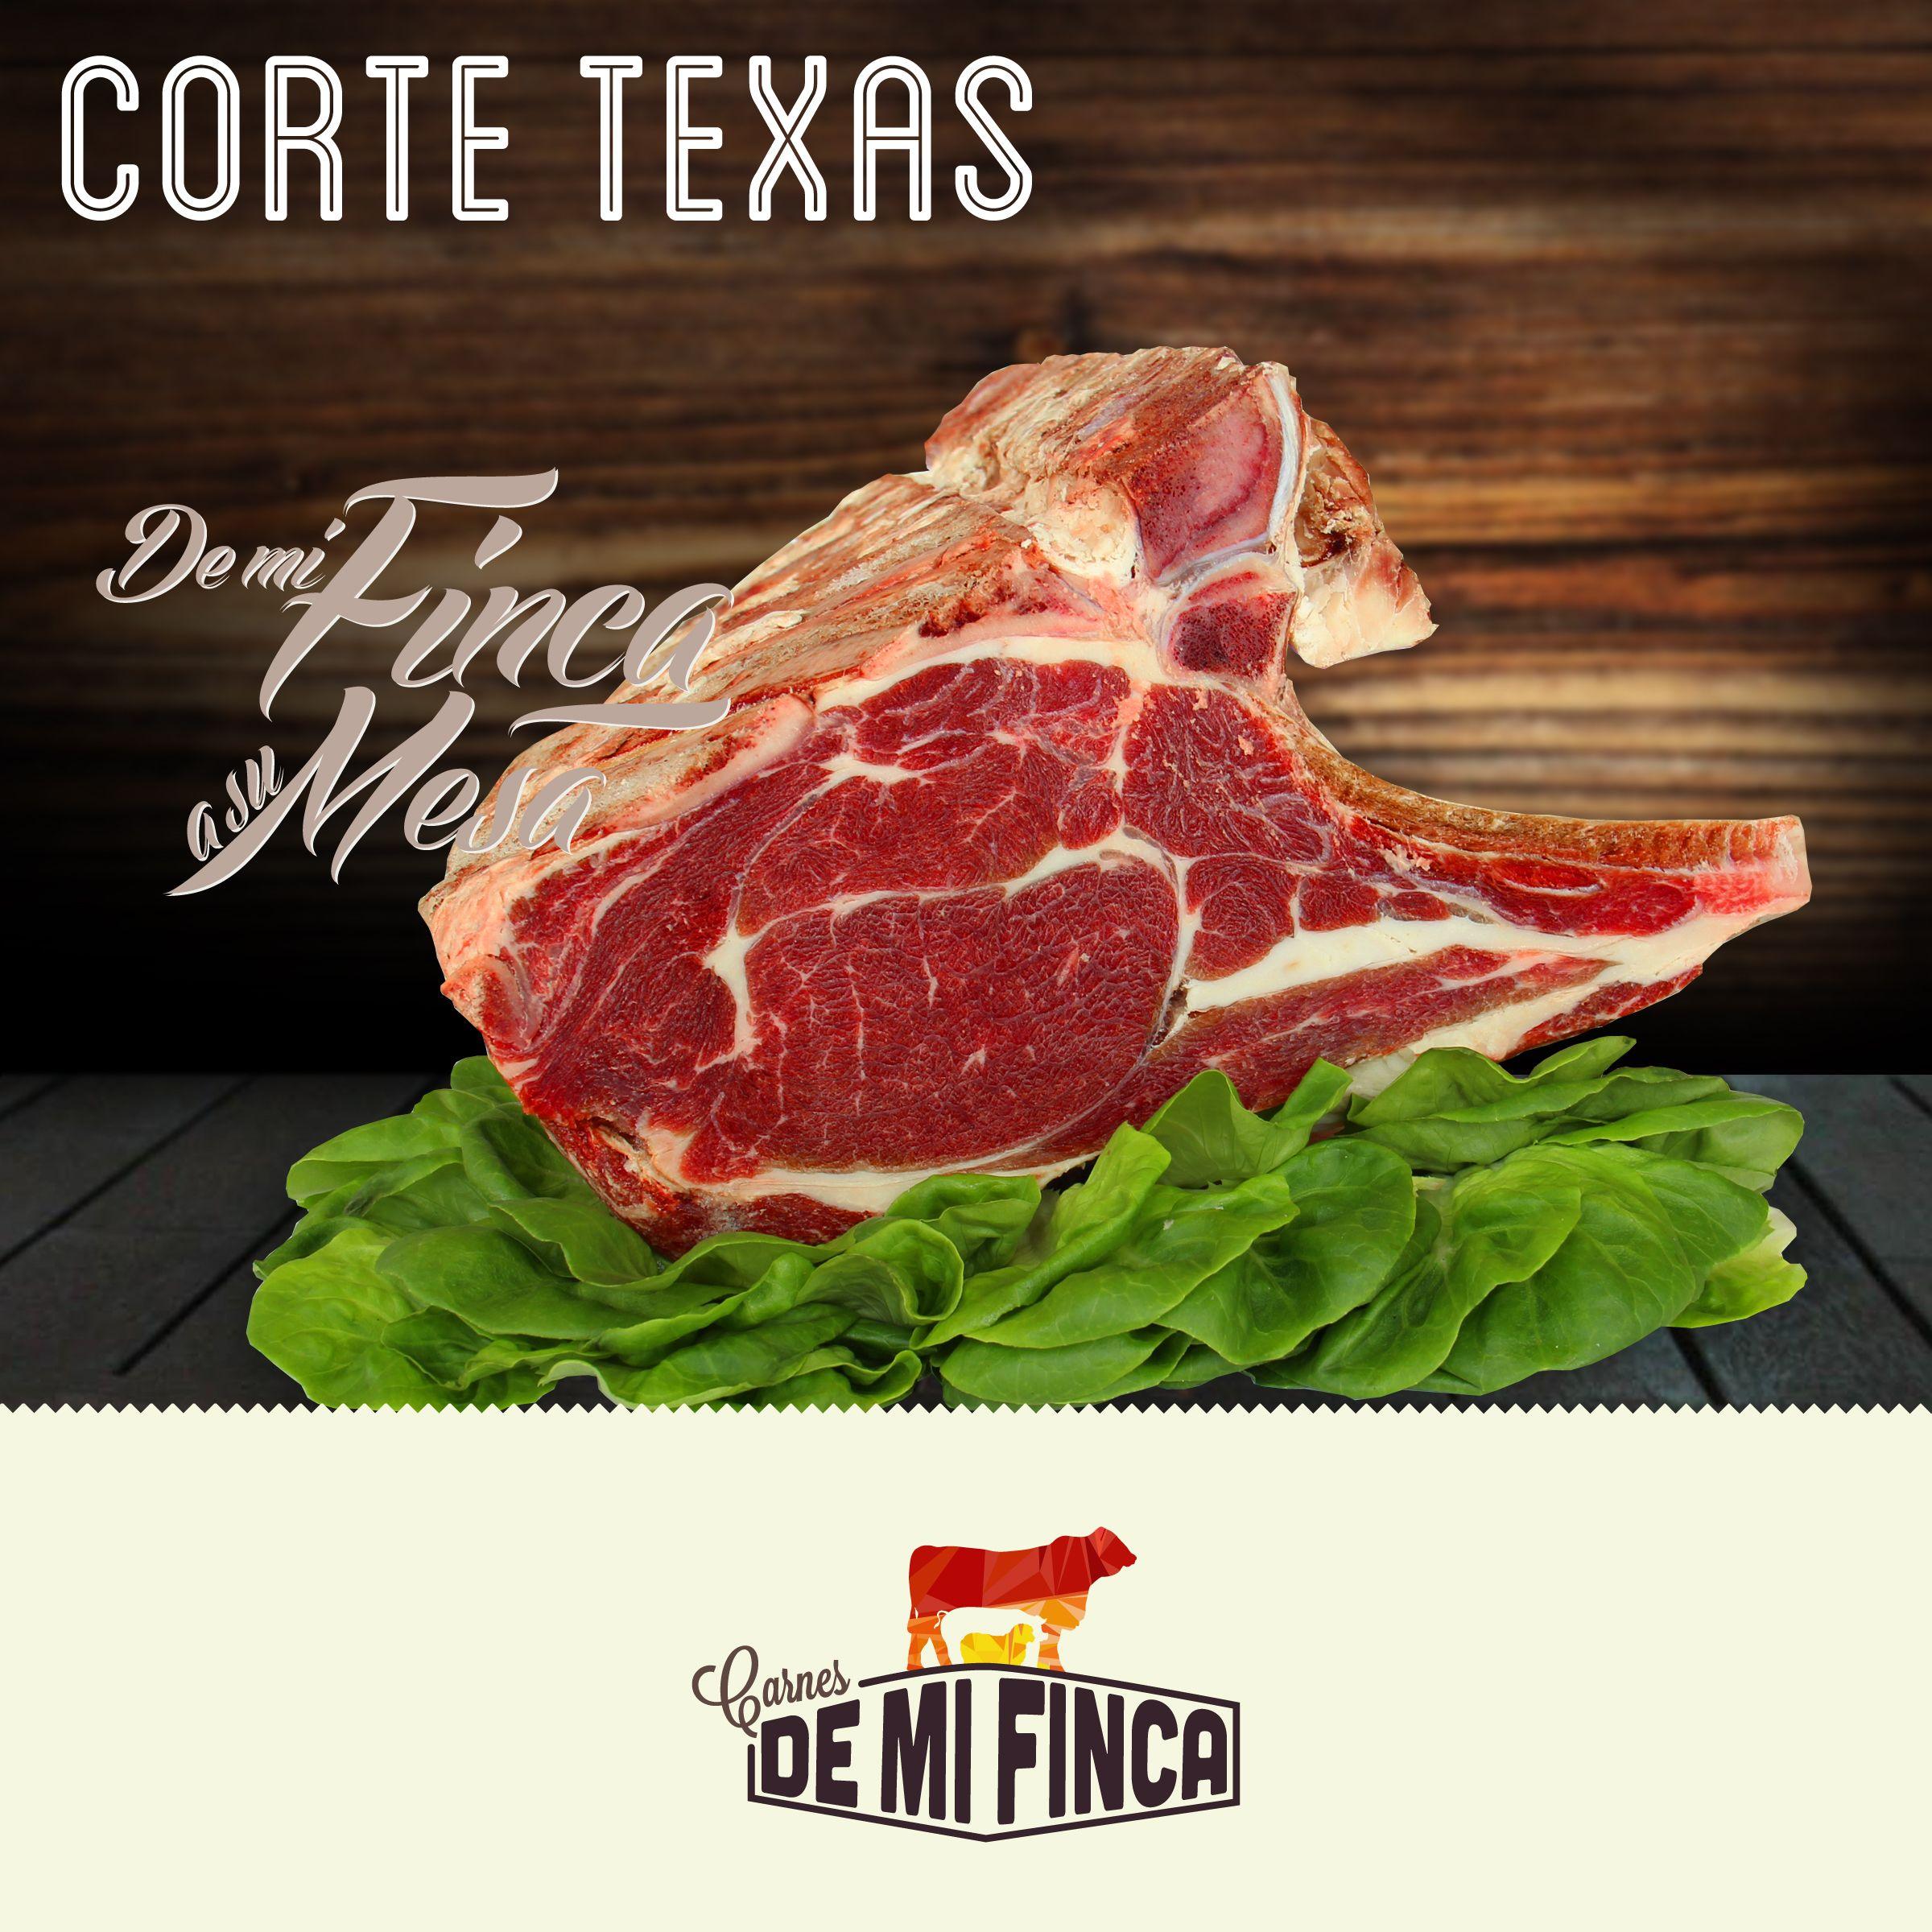 Texas Cut Corte Texas carnes res cortes carniceria